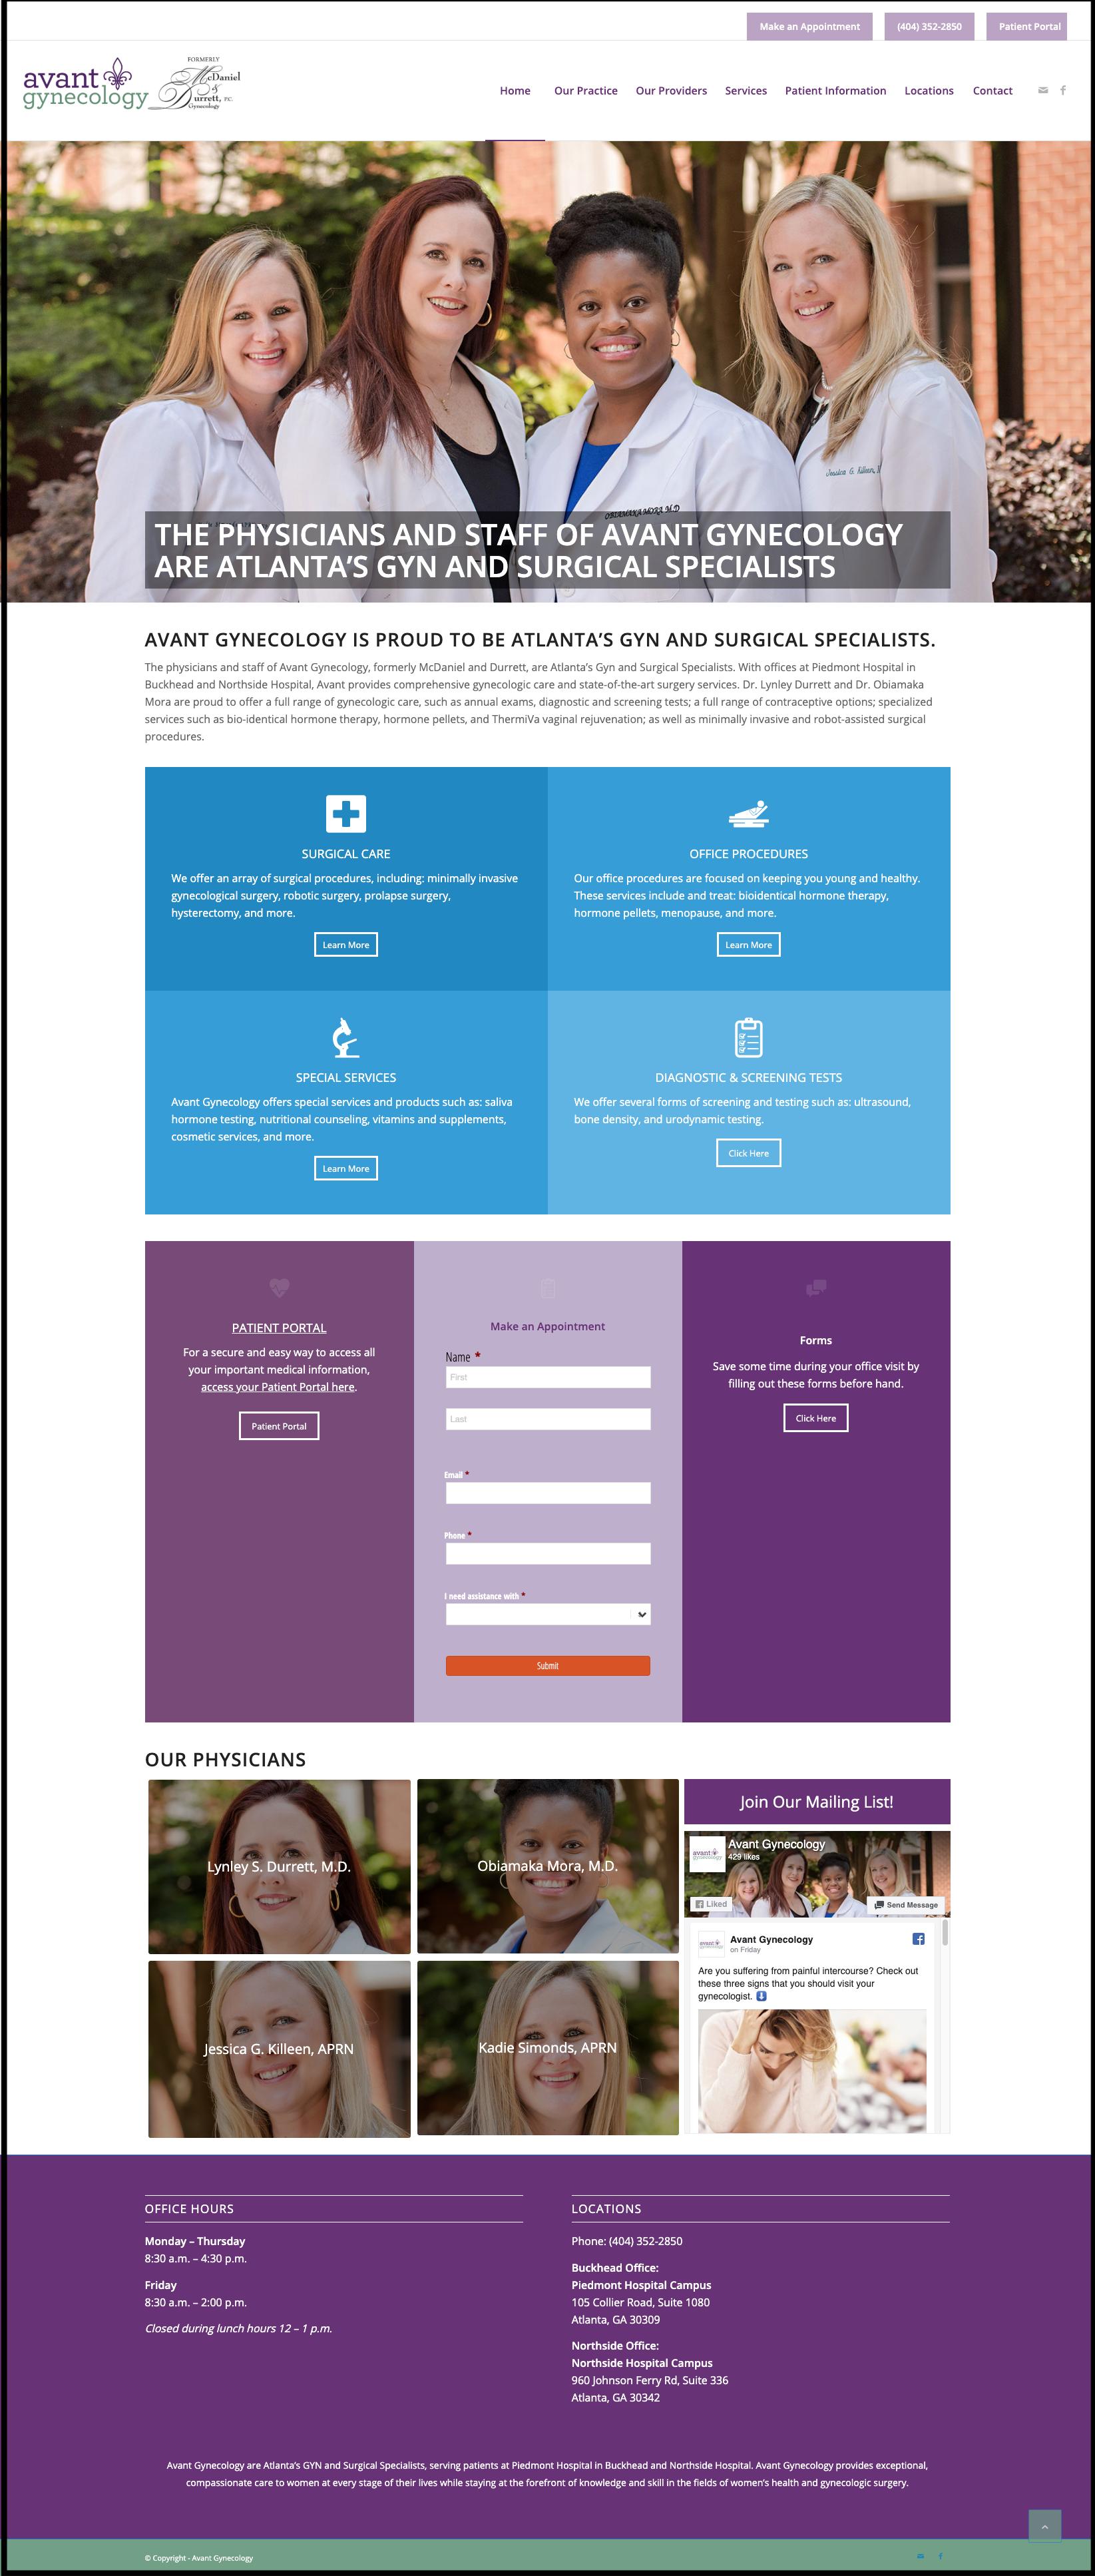 Marketing Archives - Lenz Marketing